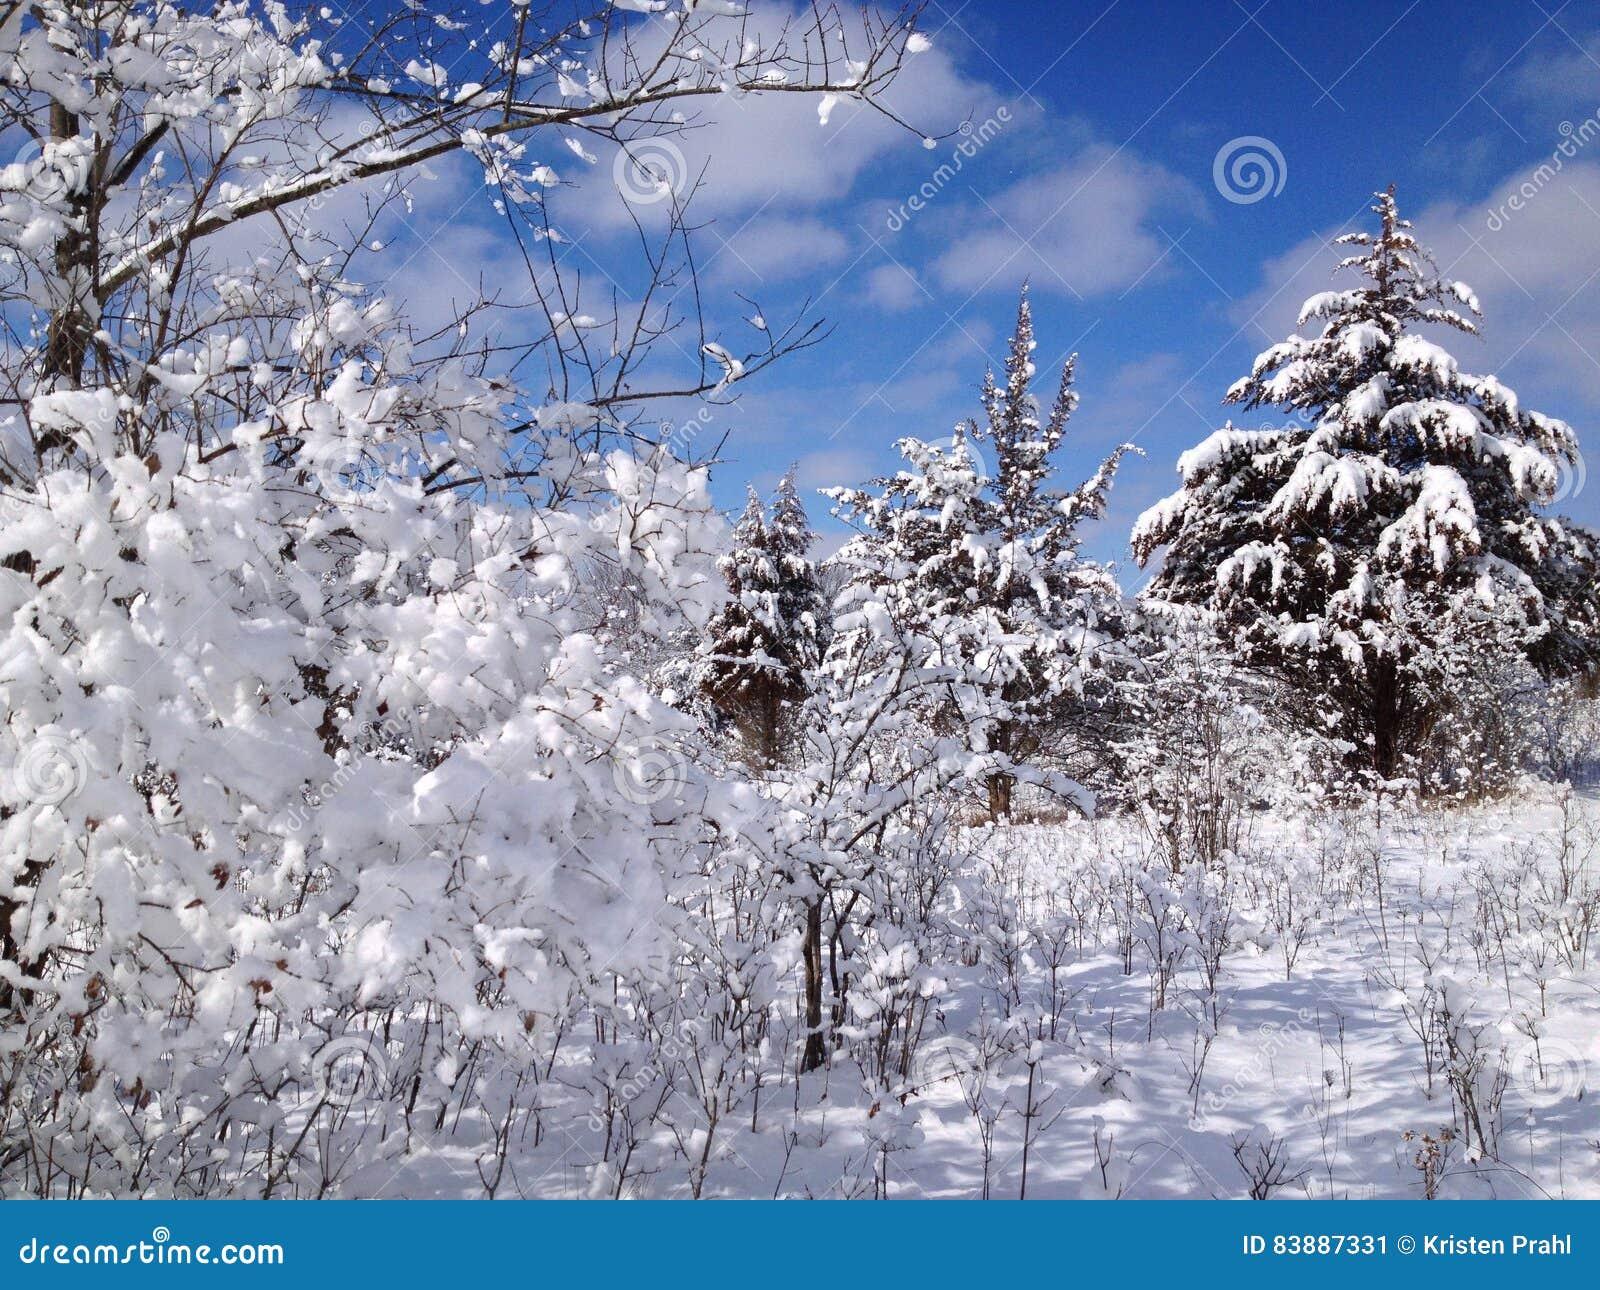 Winter wonderland in woods after heavy fresh snowfall